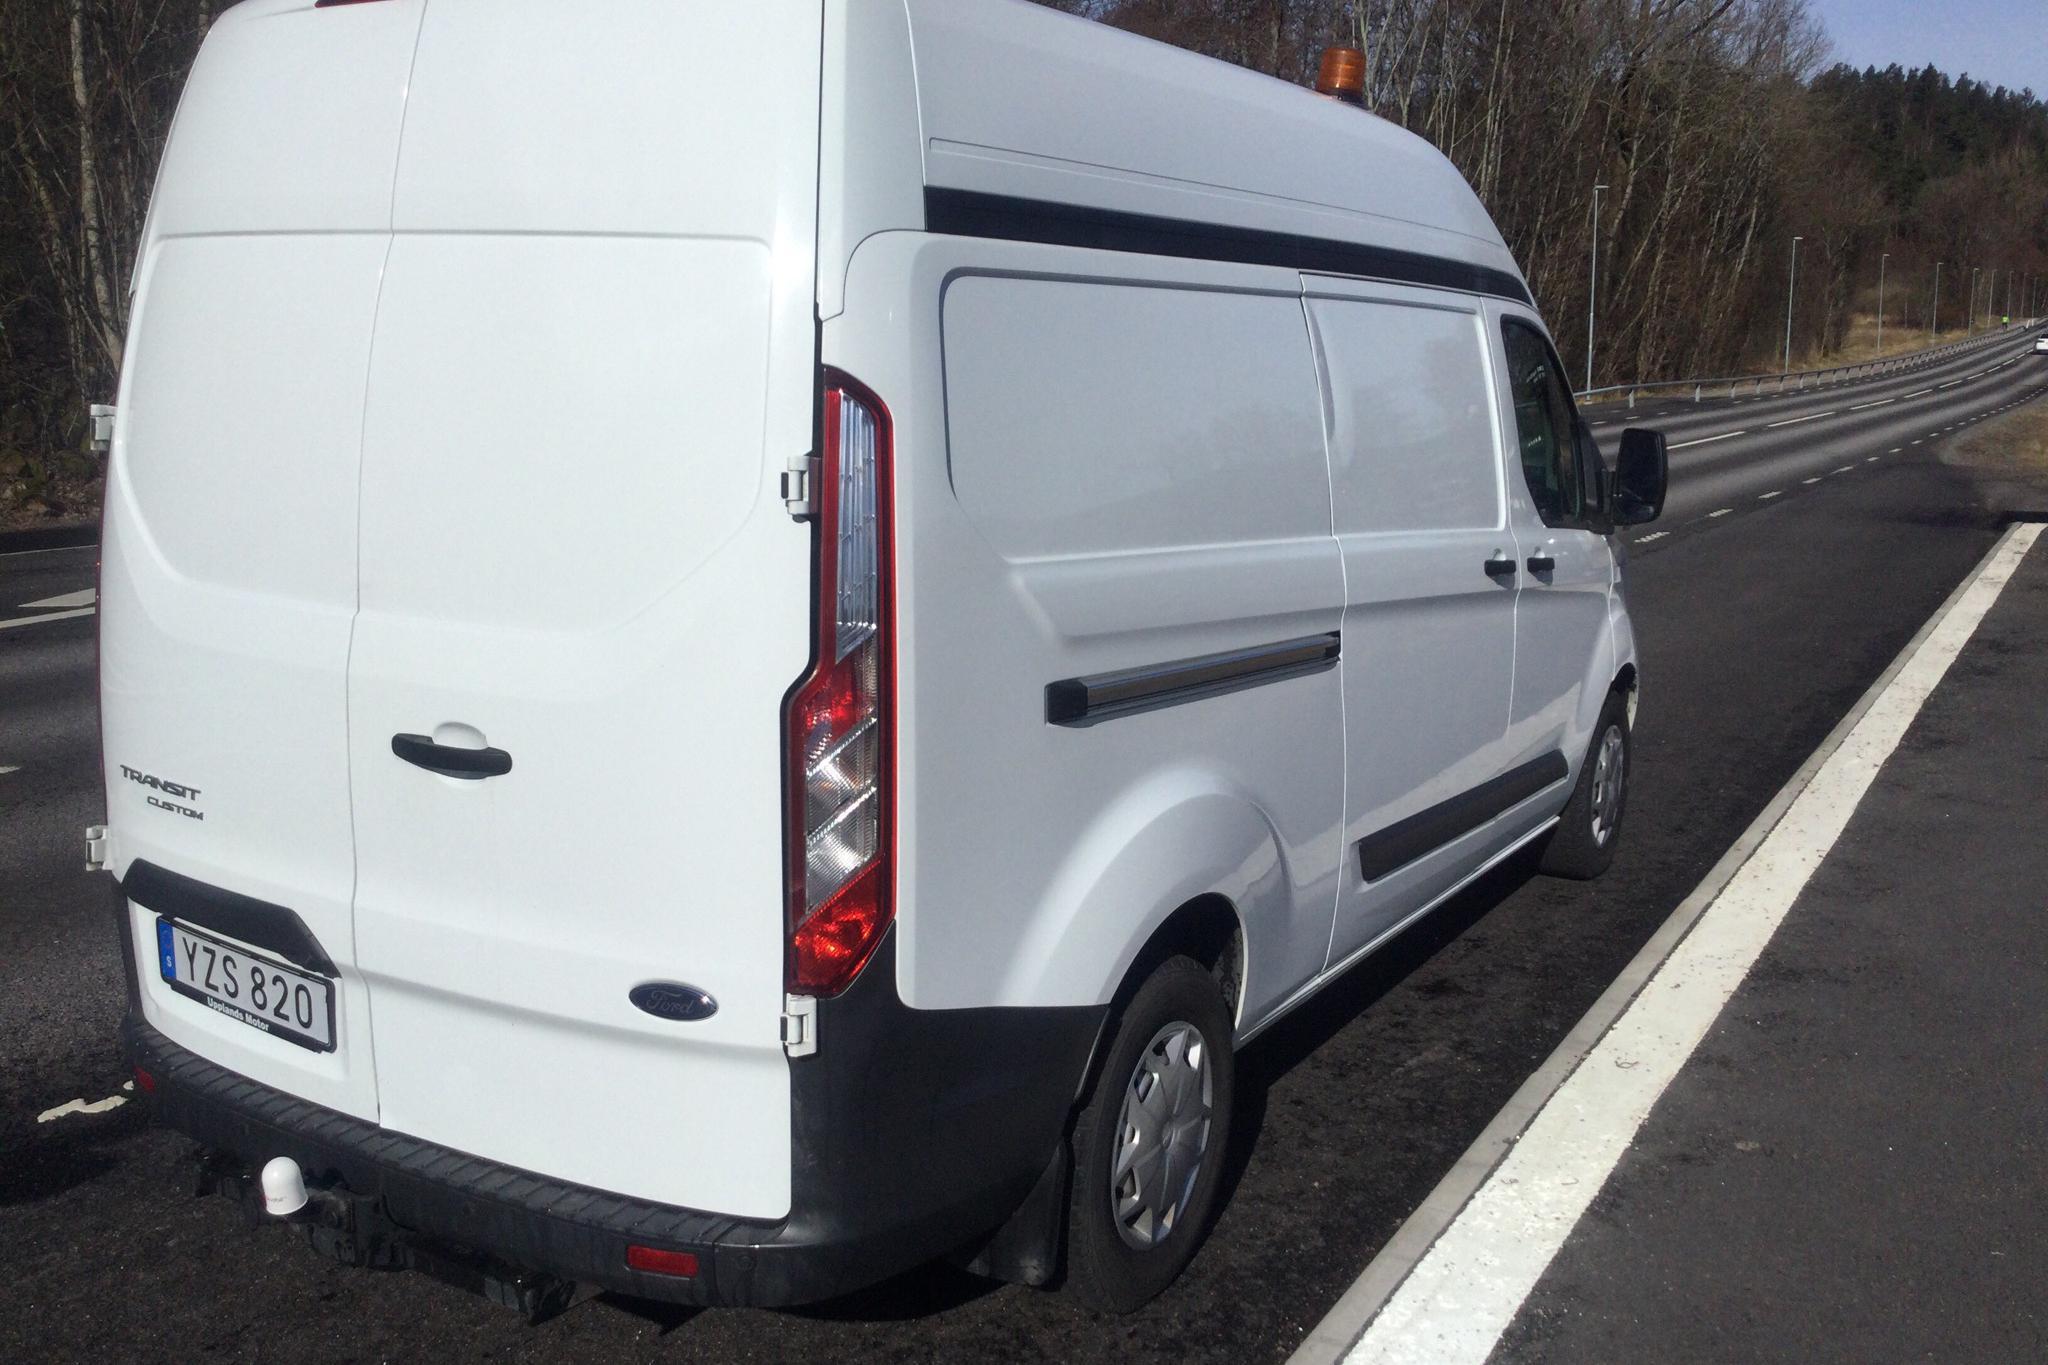 Ford Transit Custom 300 (130hk) - 31 400 km - Manual - white - 2018